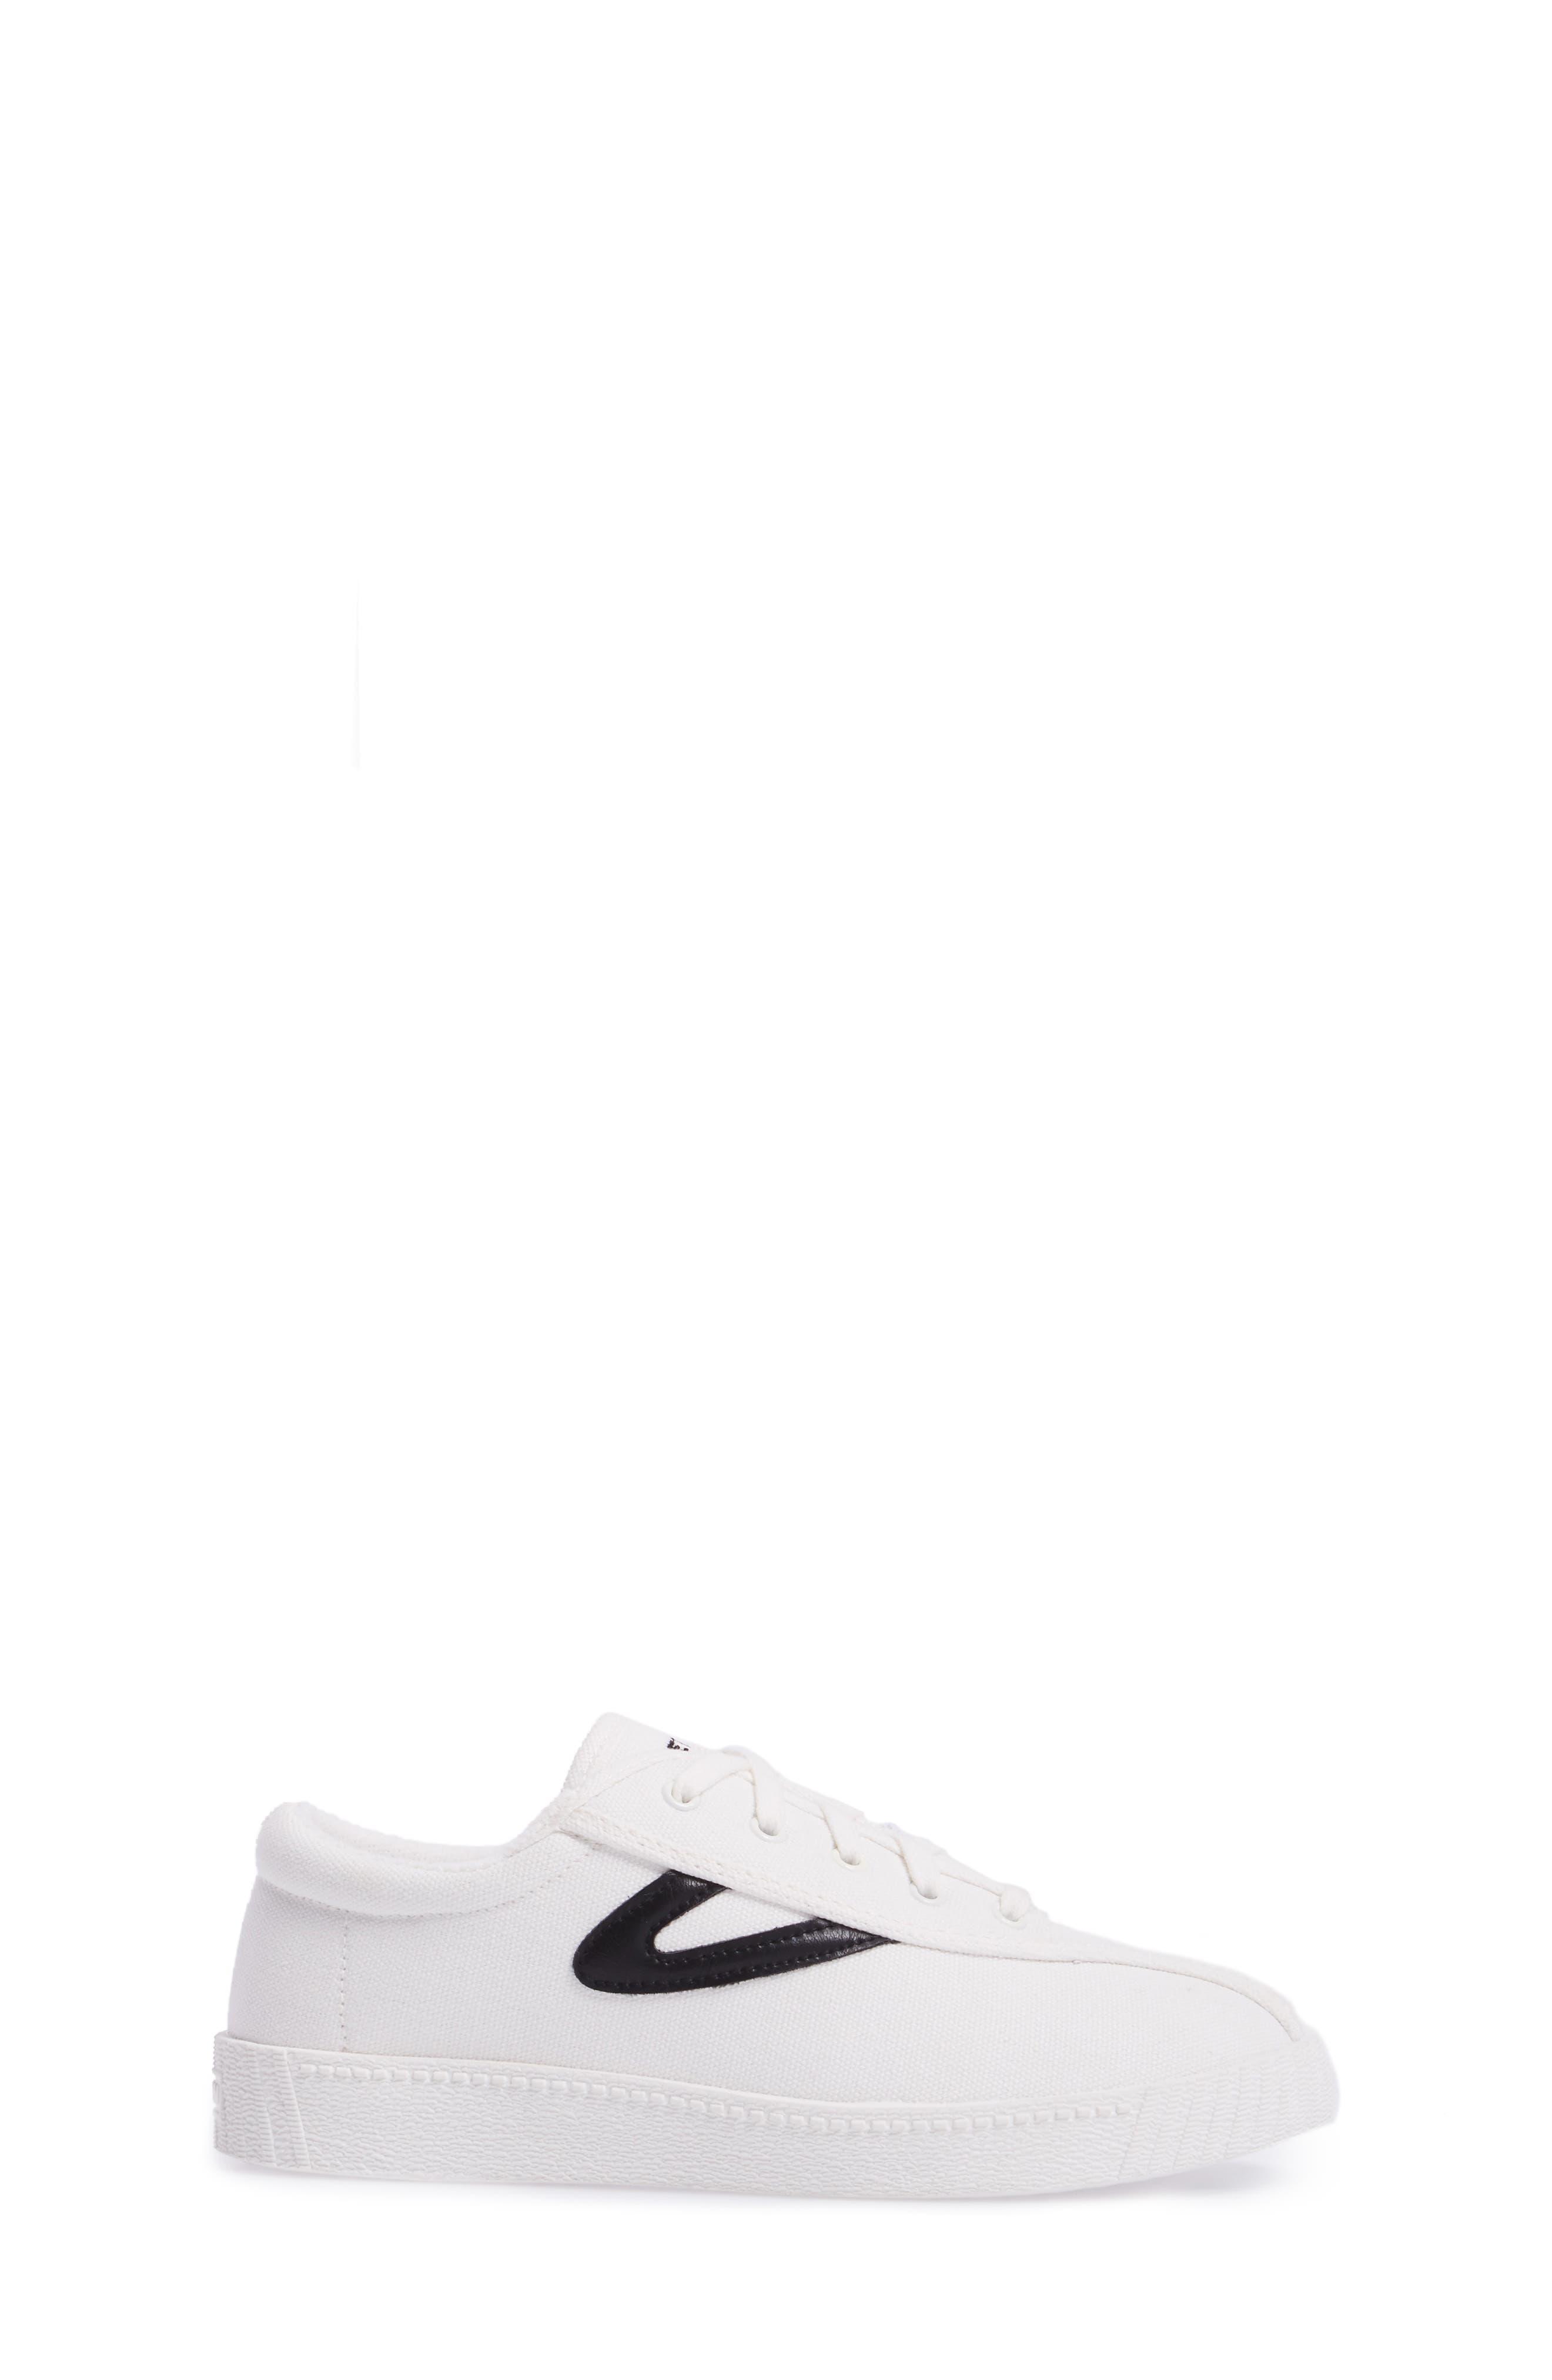 Nylite Plus Sneaker,                             Alternate thumbnail 3, color,                             White/ Black